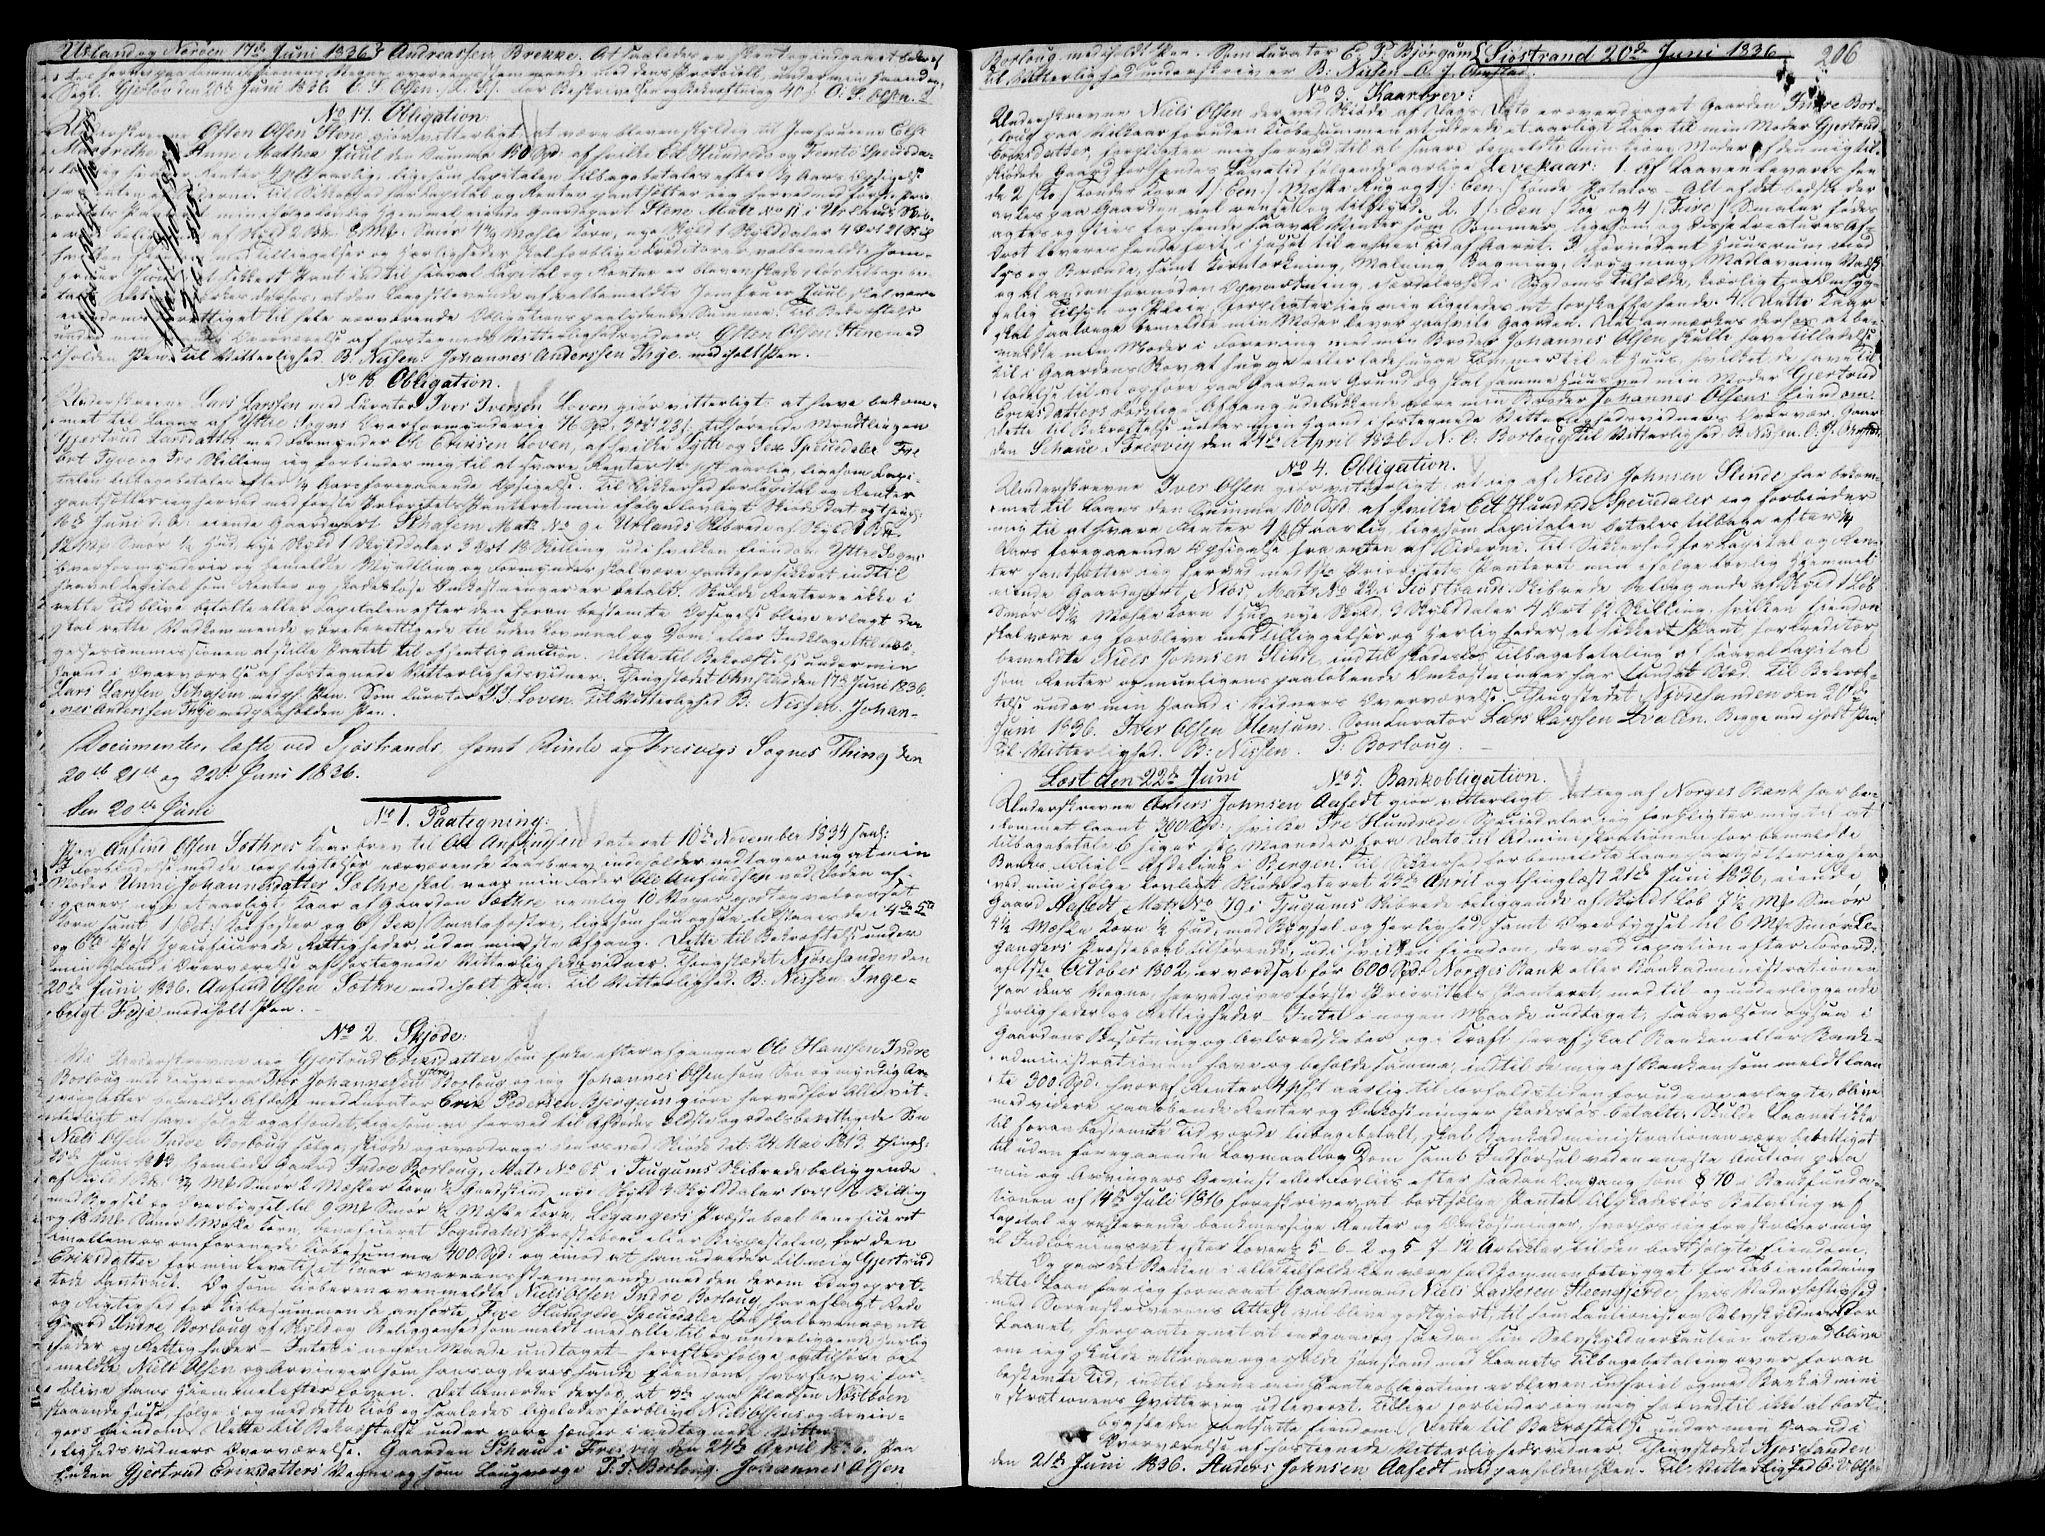 SAB, Ytre Sogn Tingrett, G/Gb/L0010: Pantebok nr. II.B.10, 1833-1839, s. 206